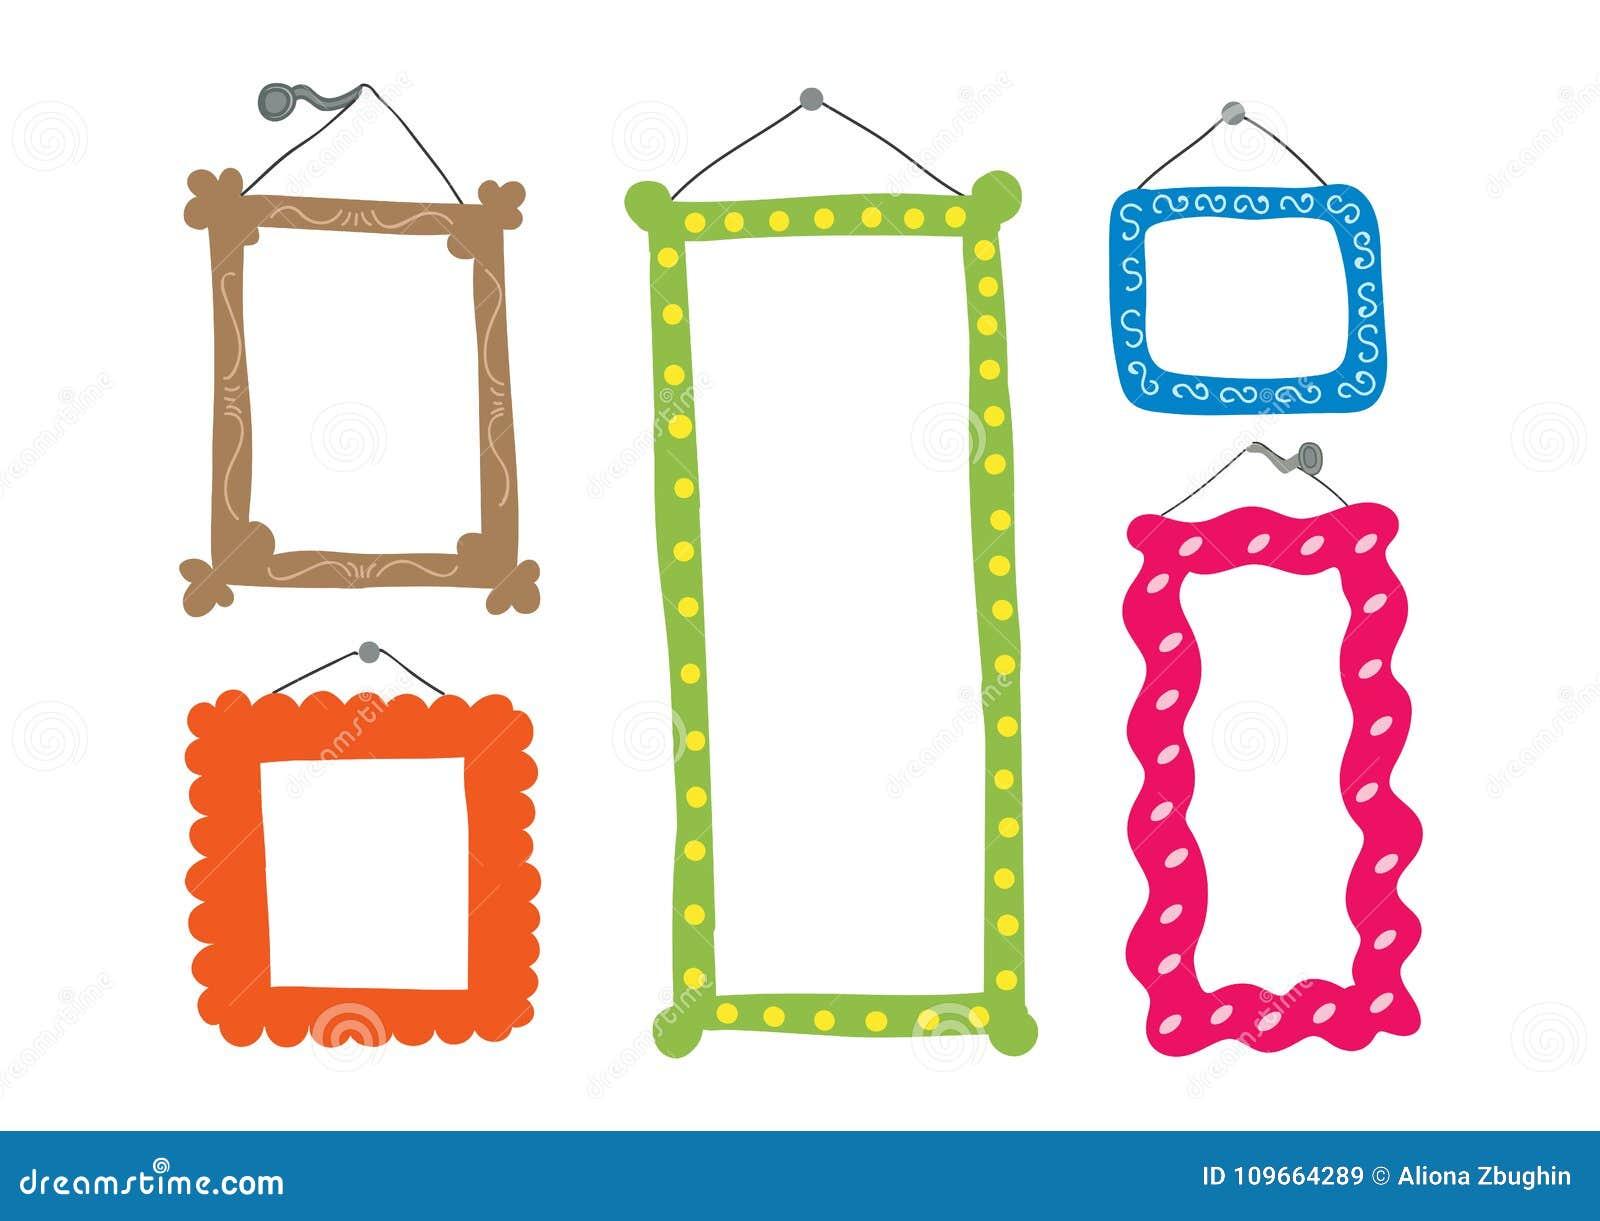 Cute frames stock illustration. Illustration of graphic ...